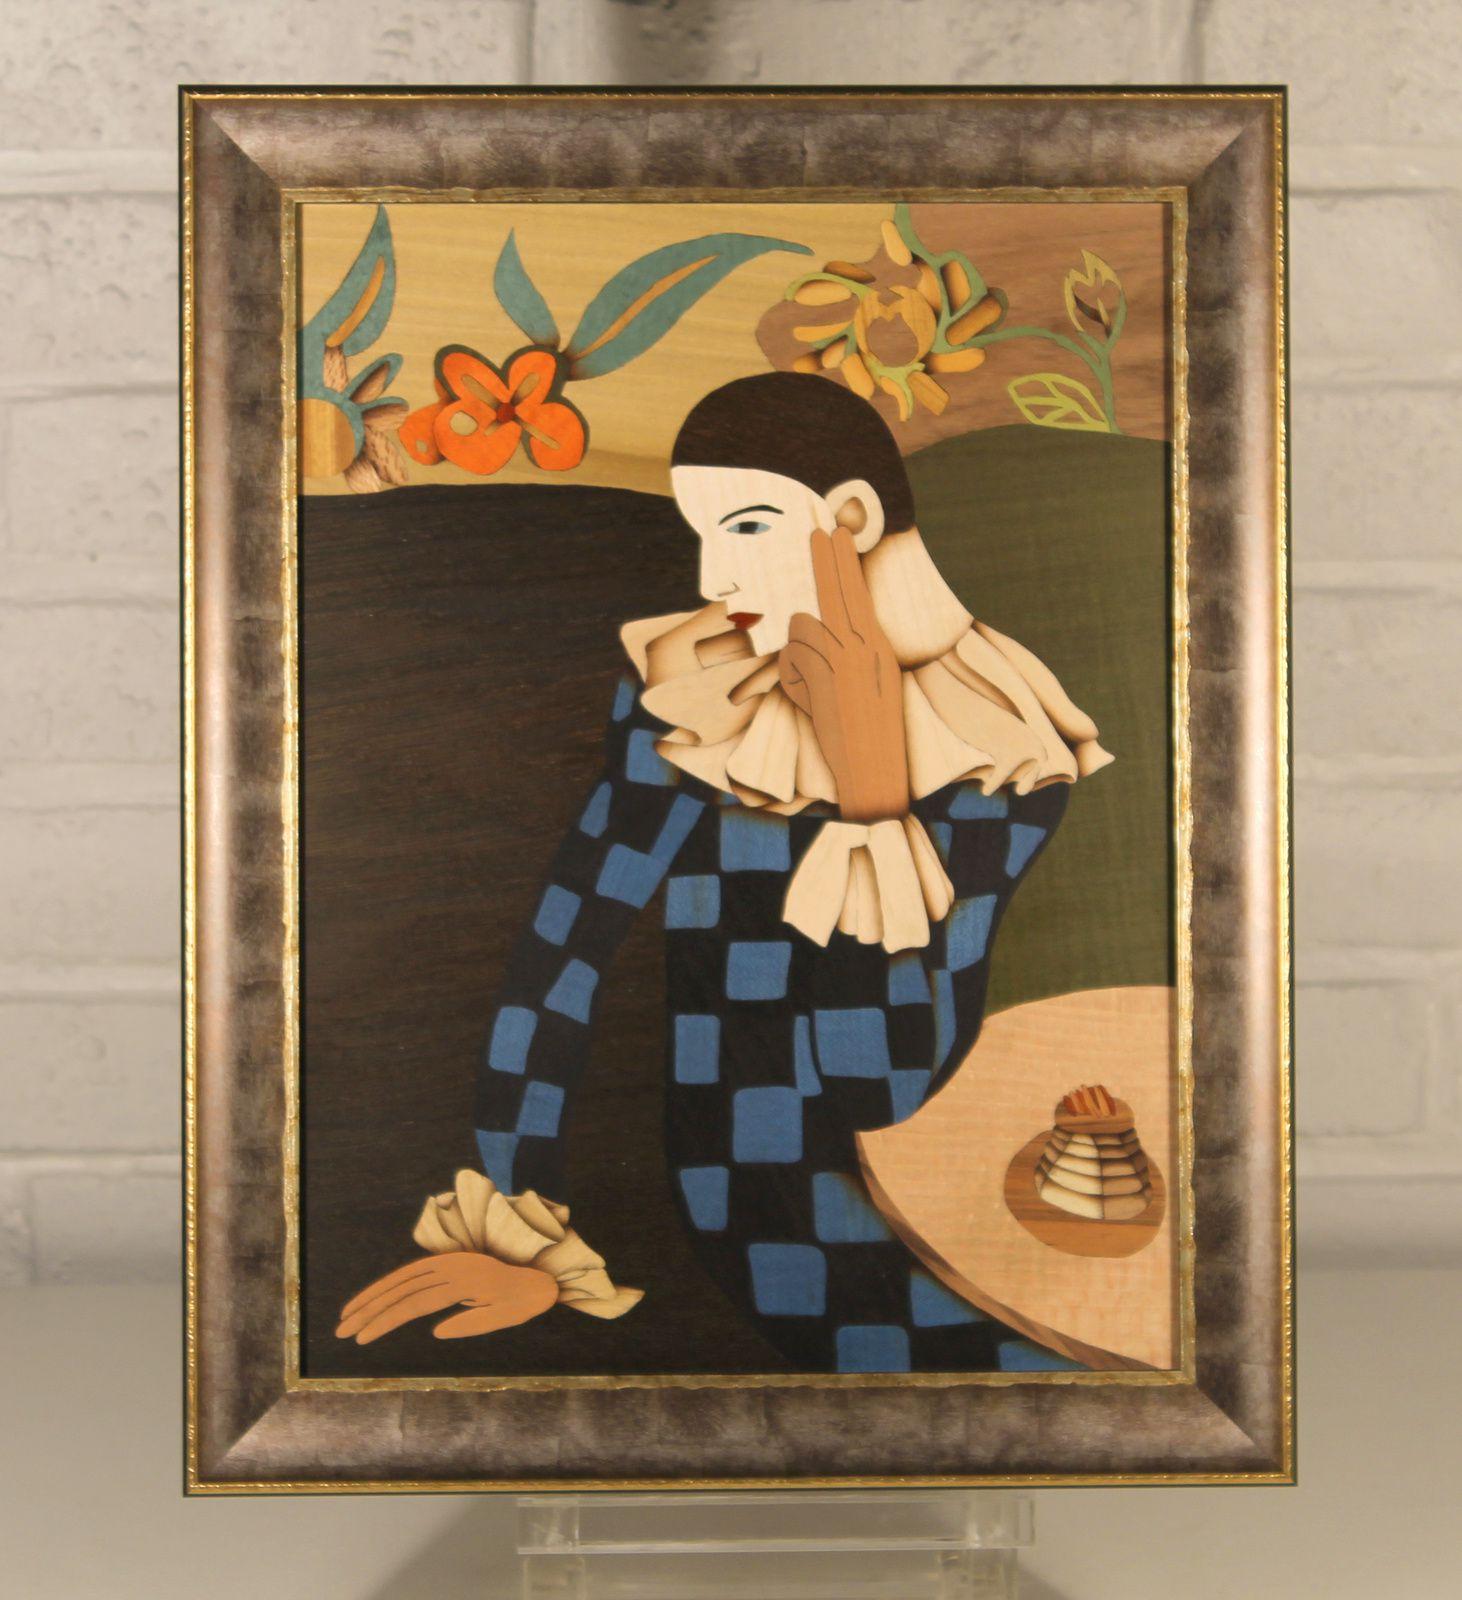 Métamorphose », exposition de 22 artisans d'art valdoisiens